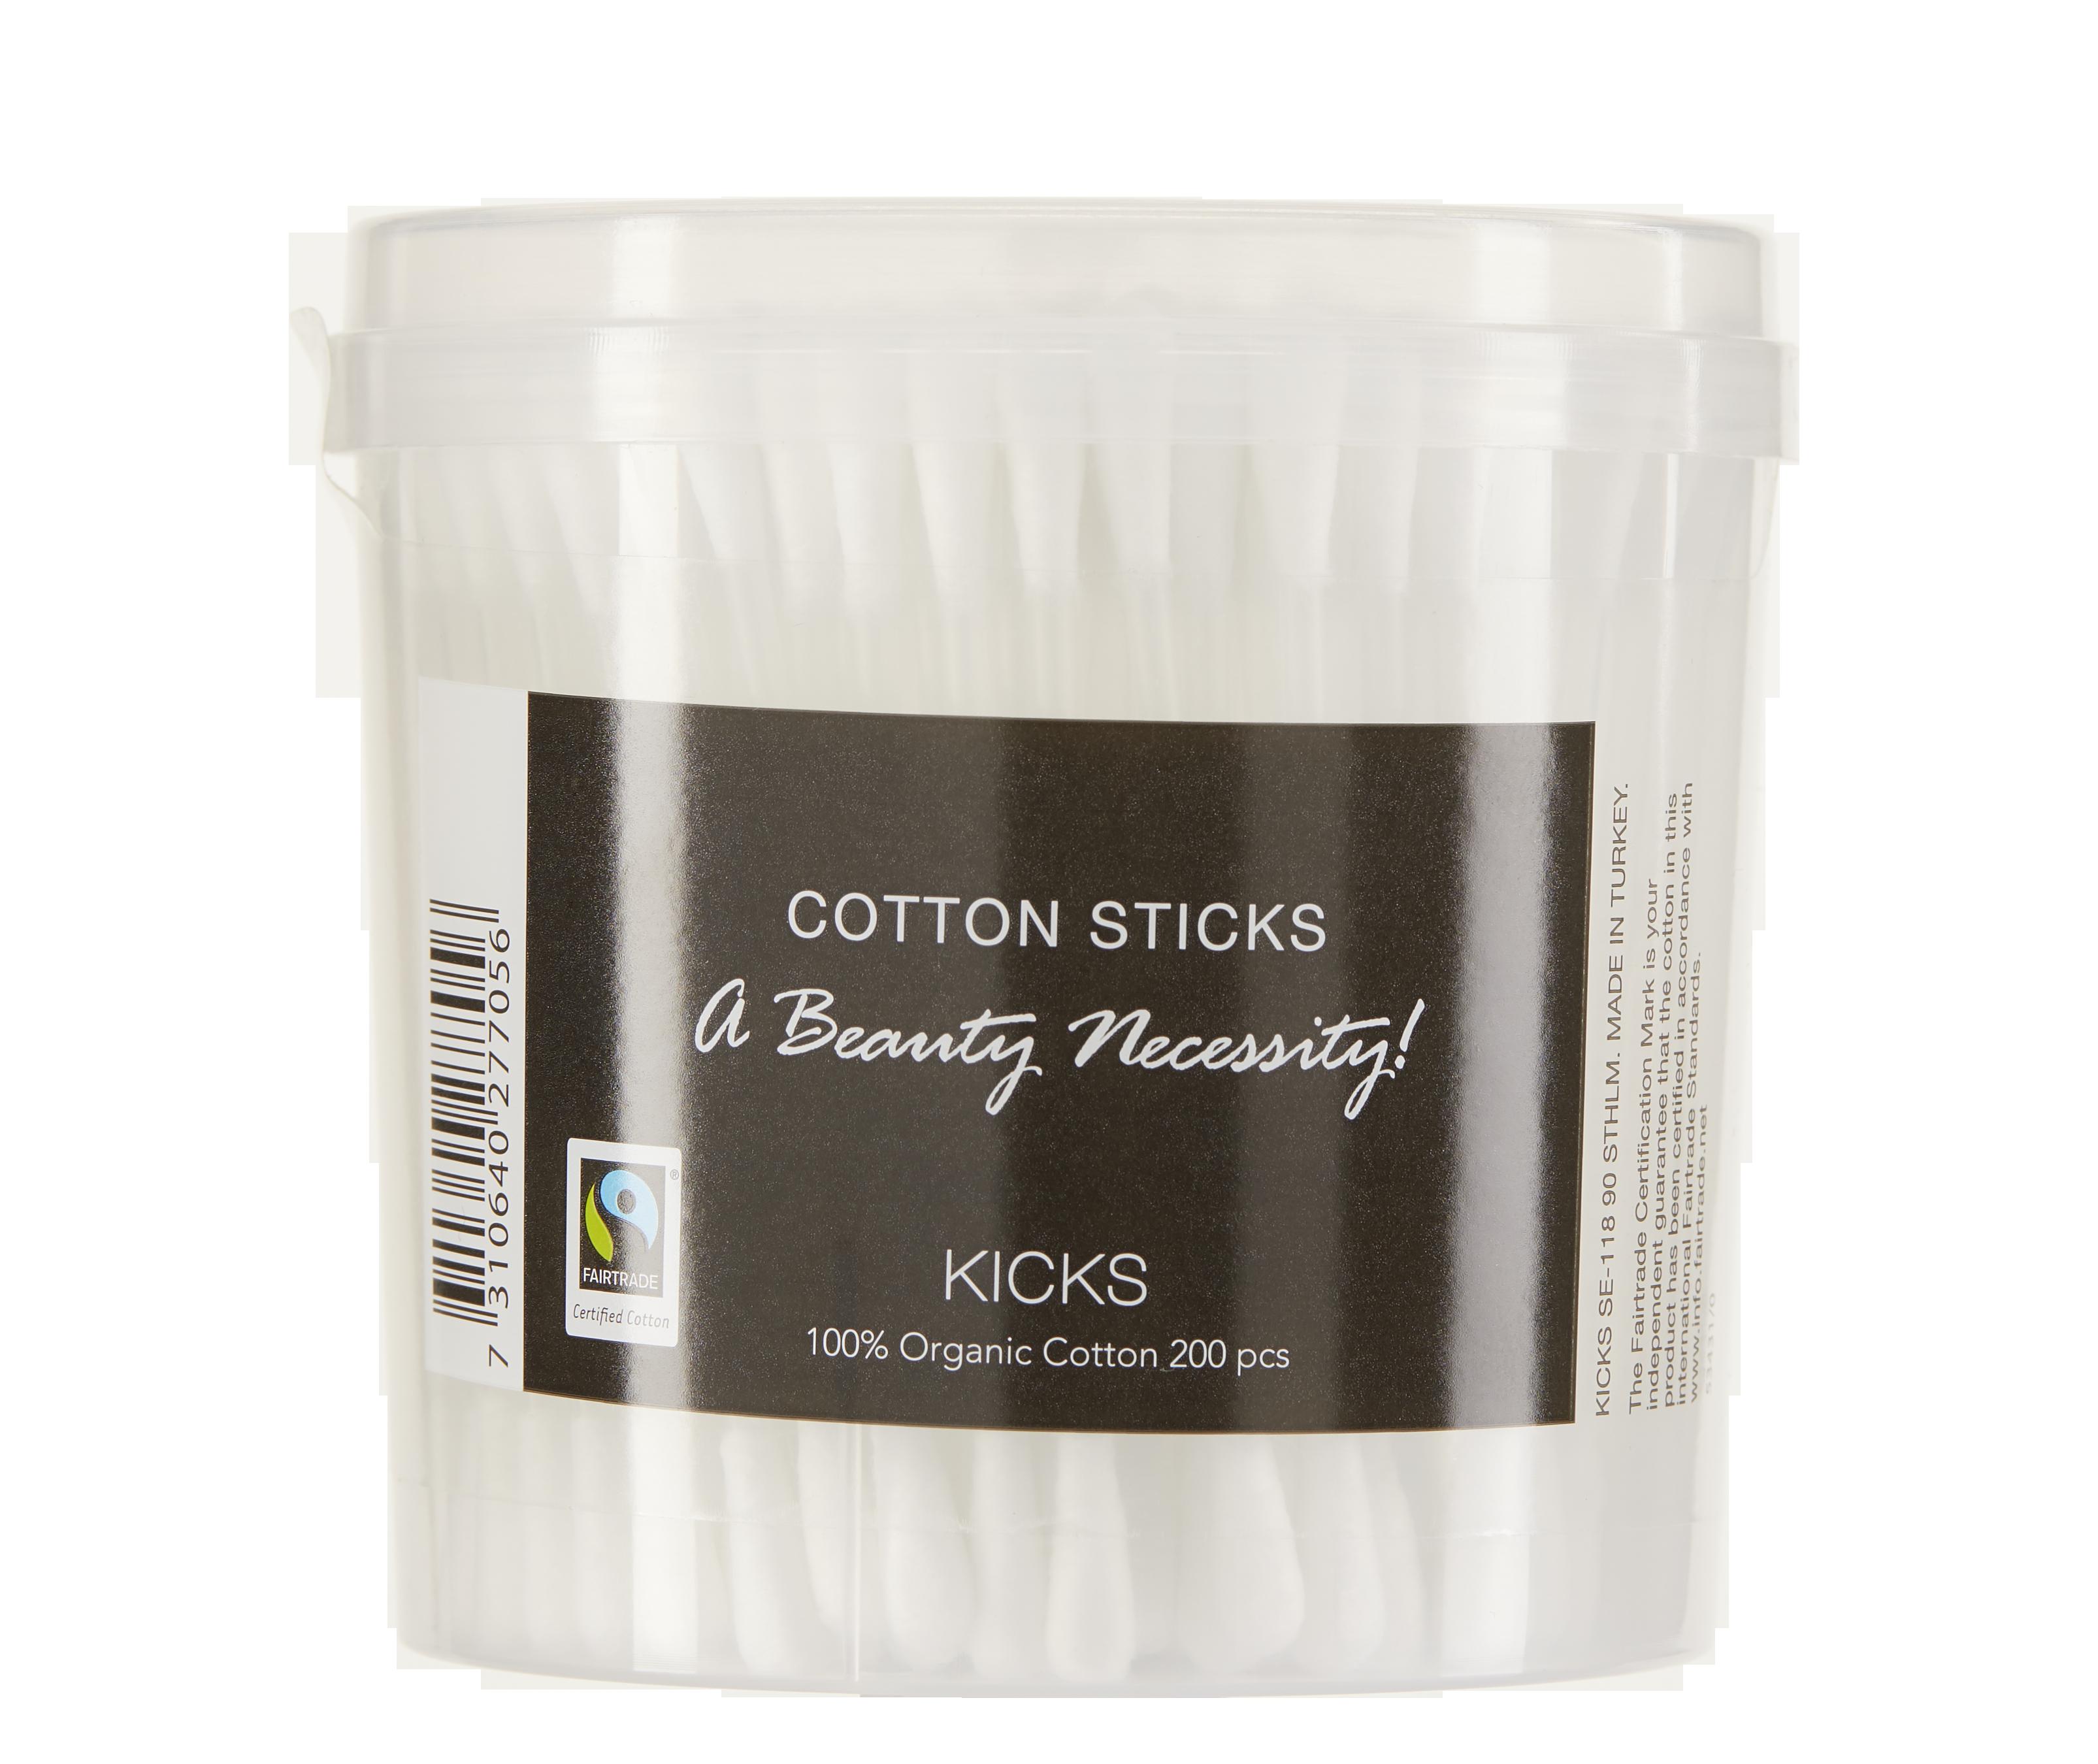 Cotton Sticks